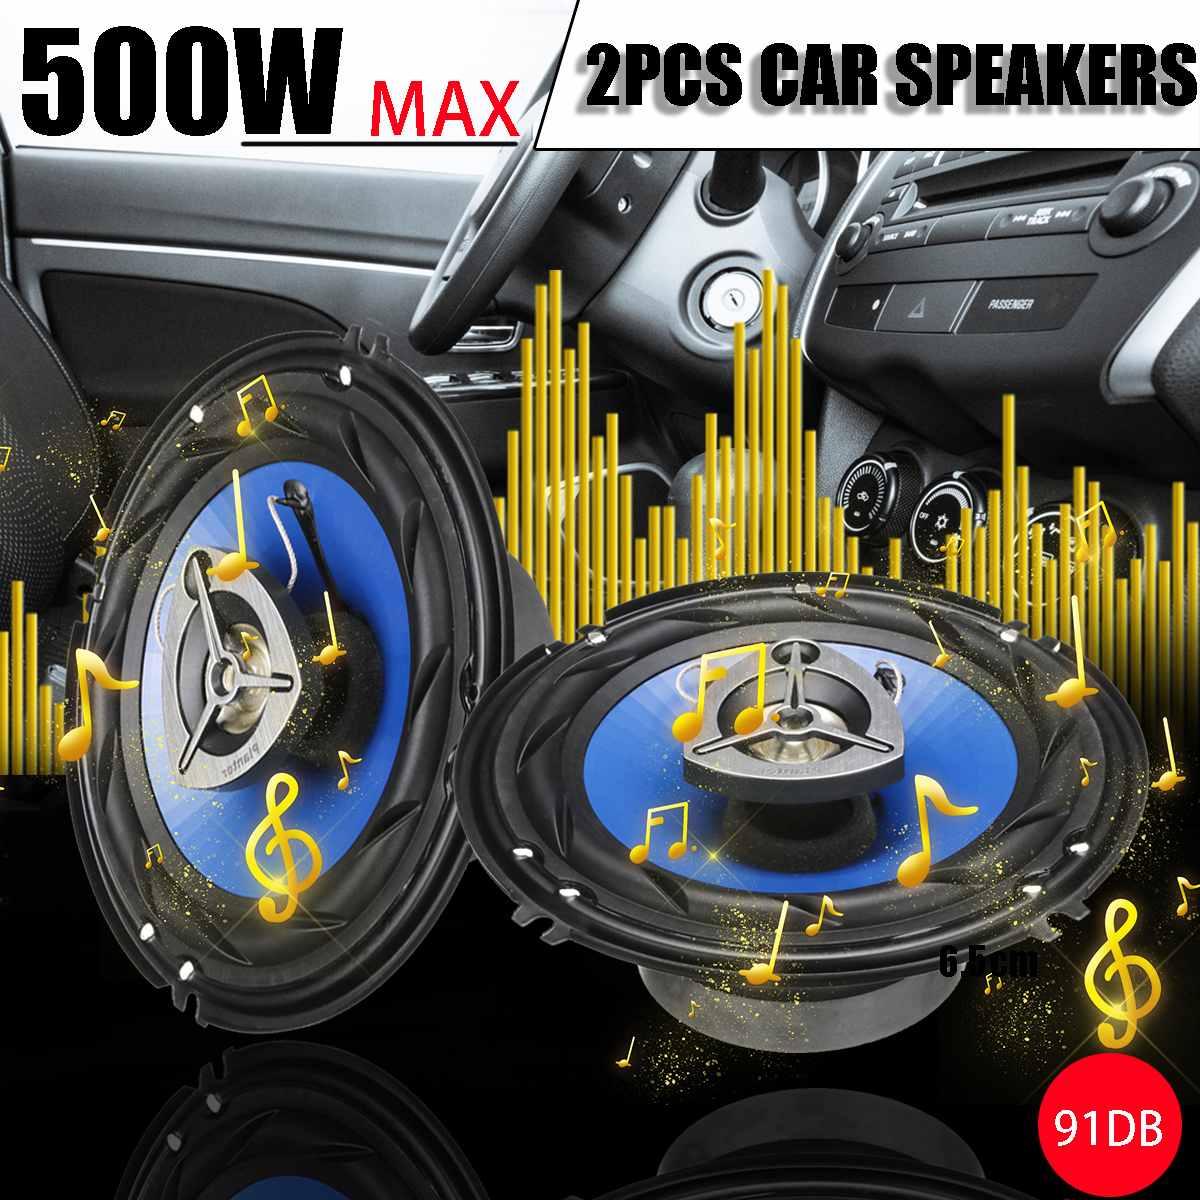 2 Pcs 500W 6.5 Inch Car HiFi Coaxial Speaker Vehicle Door Auto Audio Speaker Music Stereo Full Range Frequency Loudspeaker